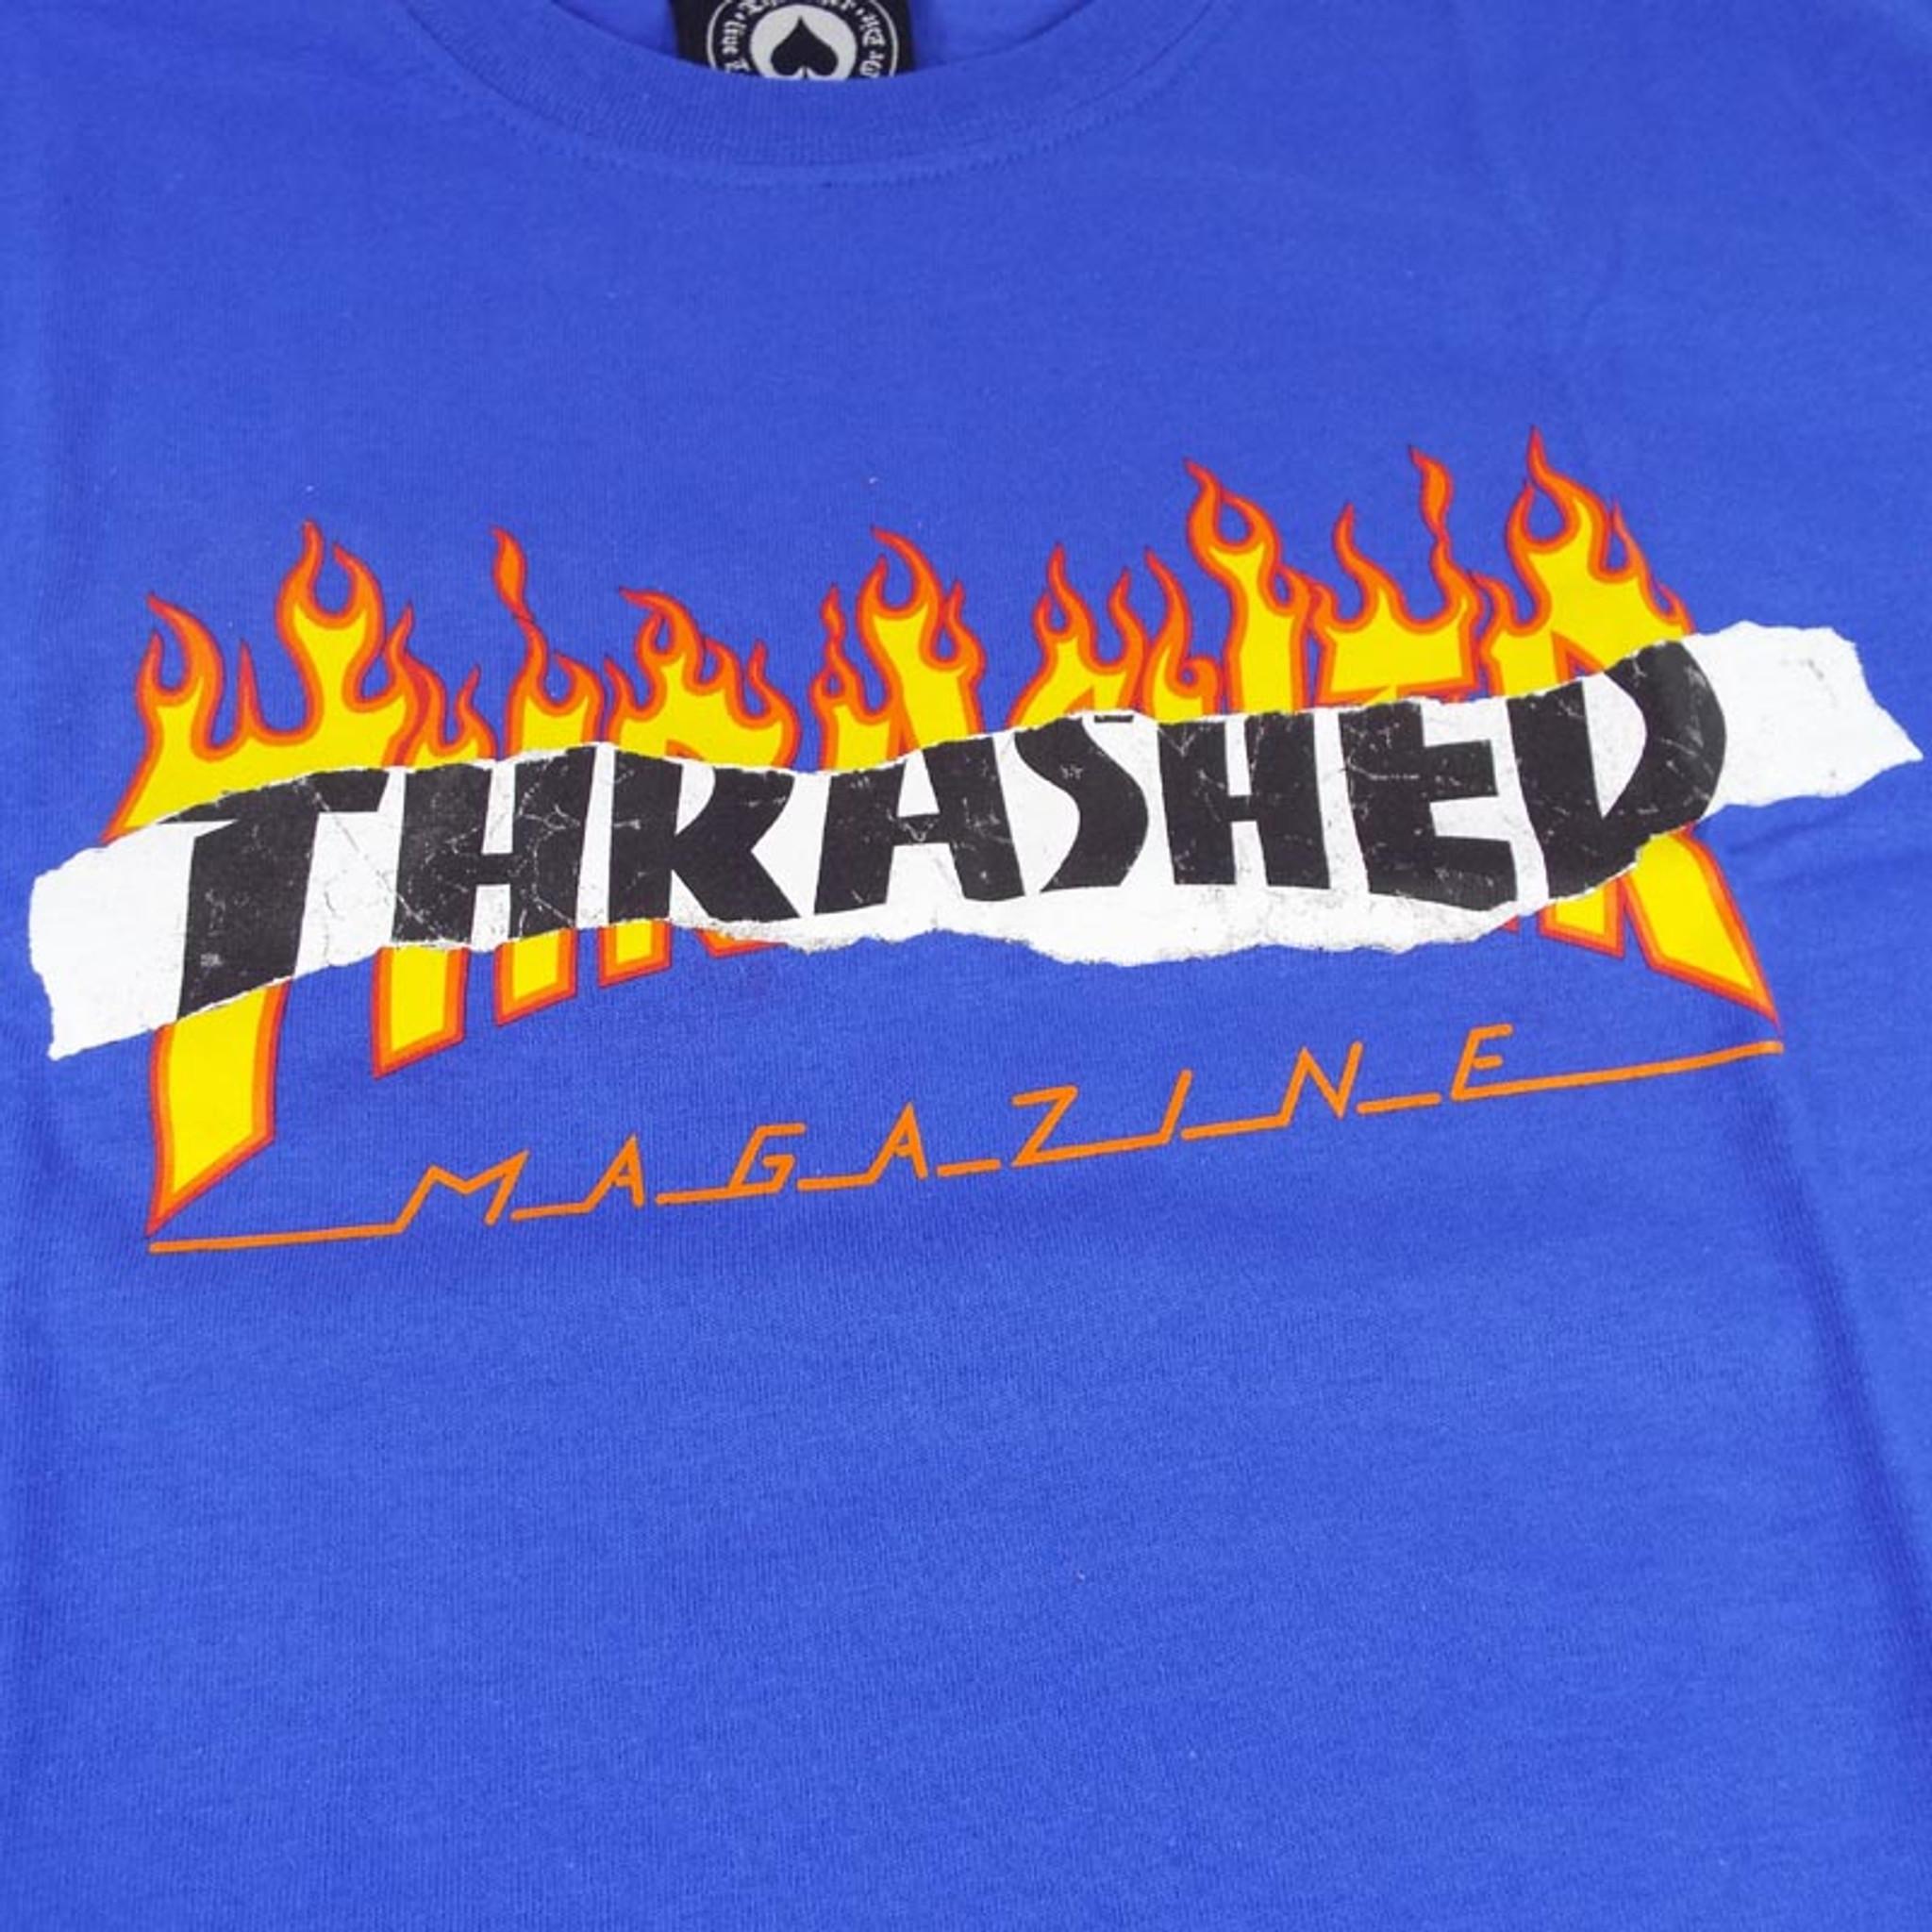 7ac68dada6f7 Thrasher Ripped T-Shirt - Royal Blue - Detroit City Skateboards Co.